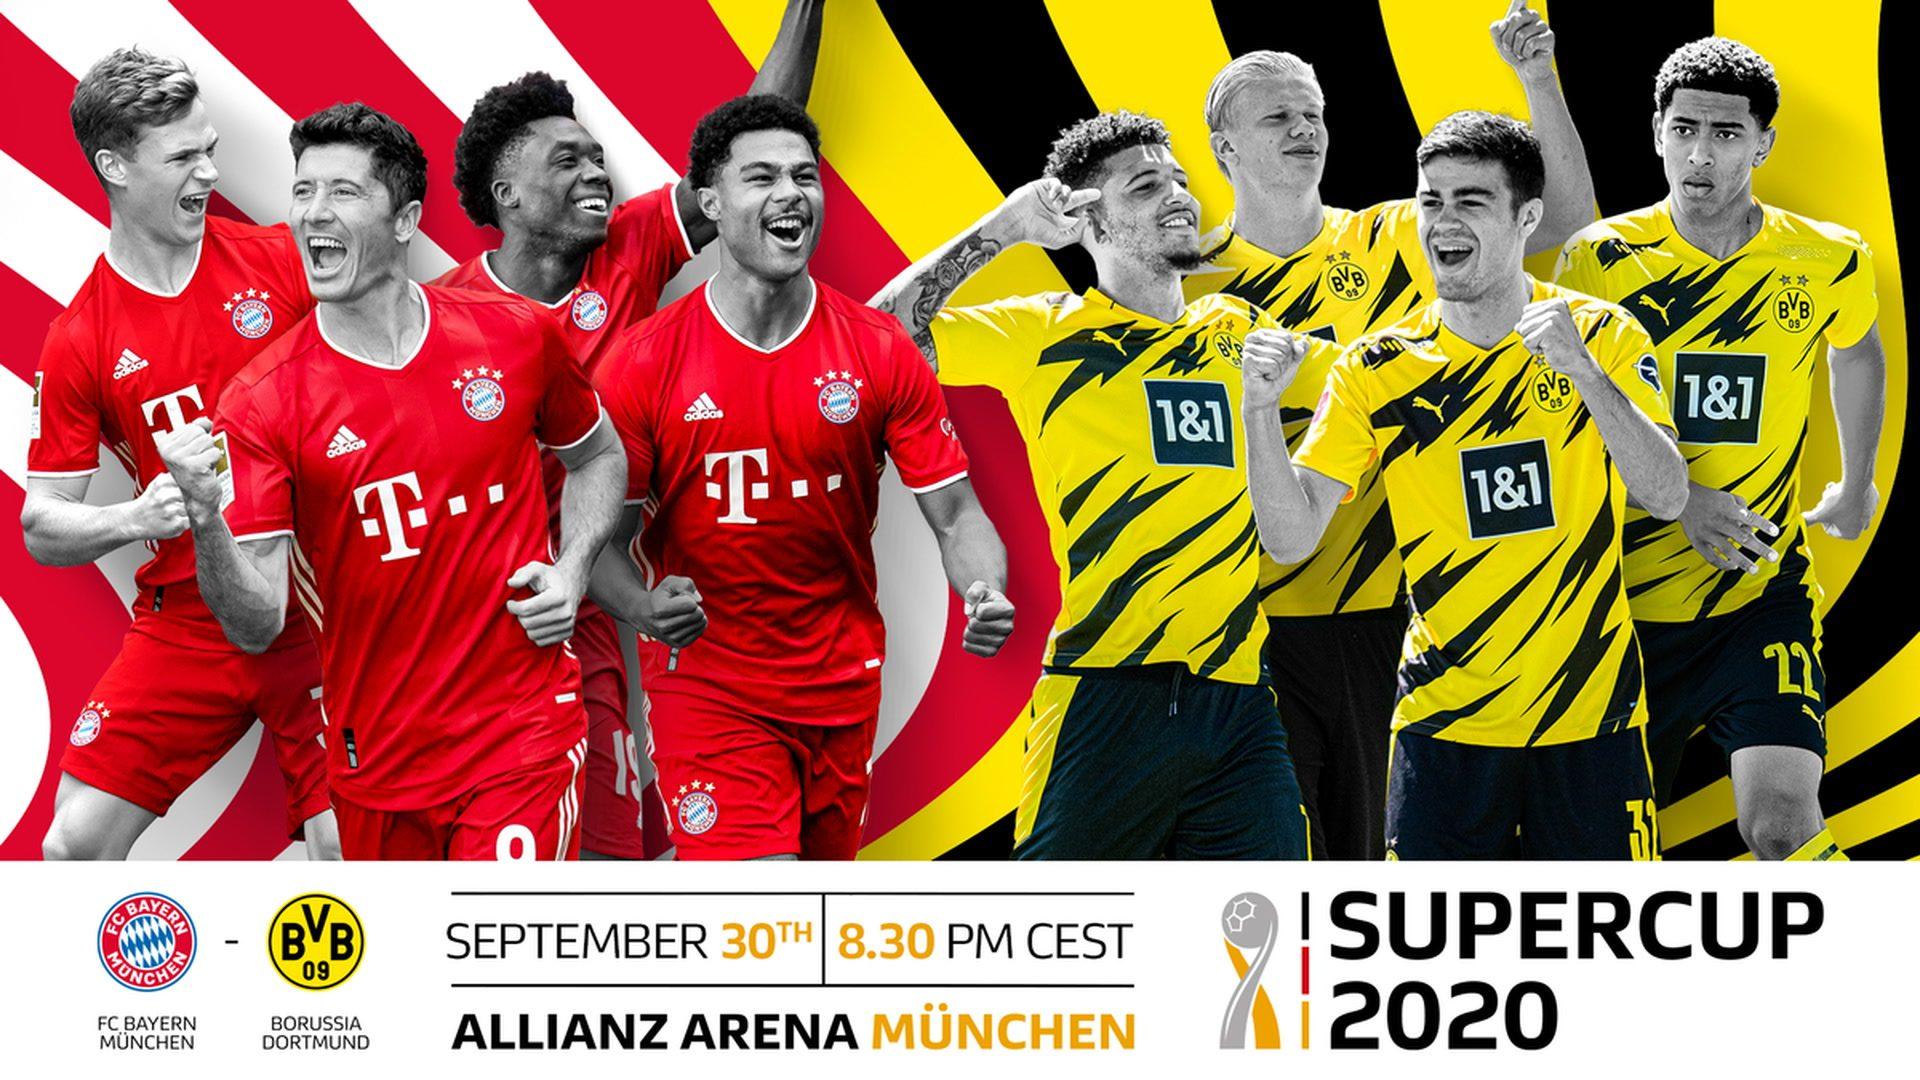 Bundesliga Bayern Munich Vs Borussia Dortmund 2020 Supercup Key Battles